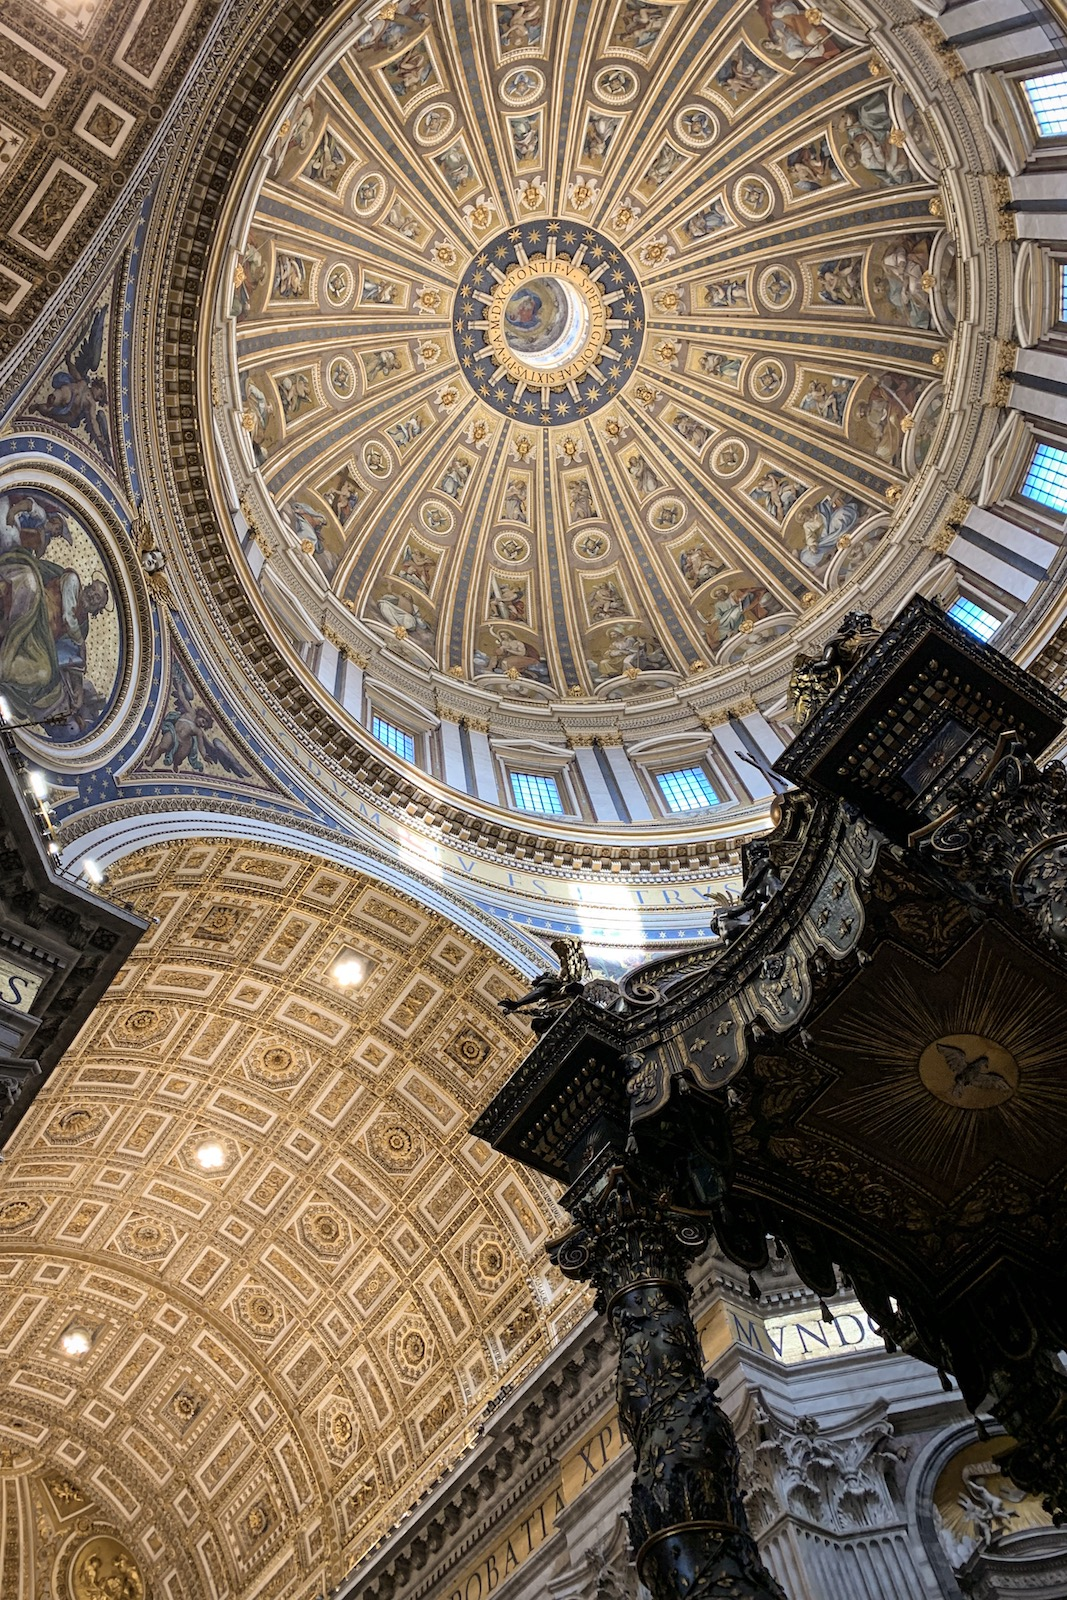 Ceiling of Saint Peter's Basilica, Vatican City